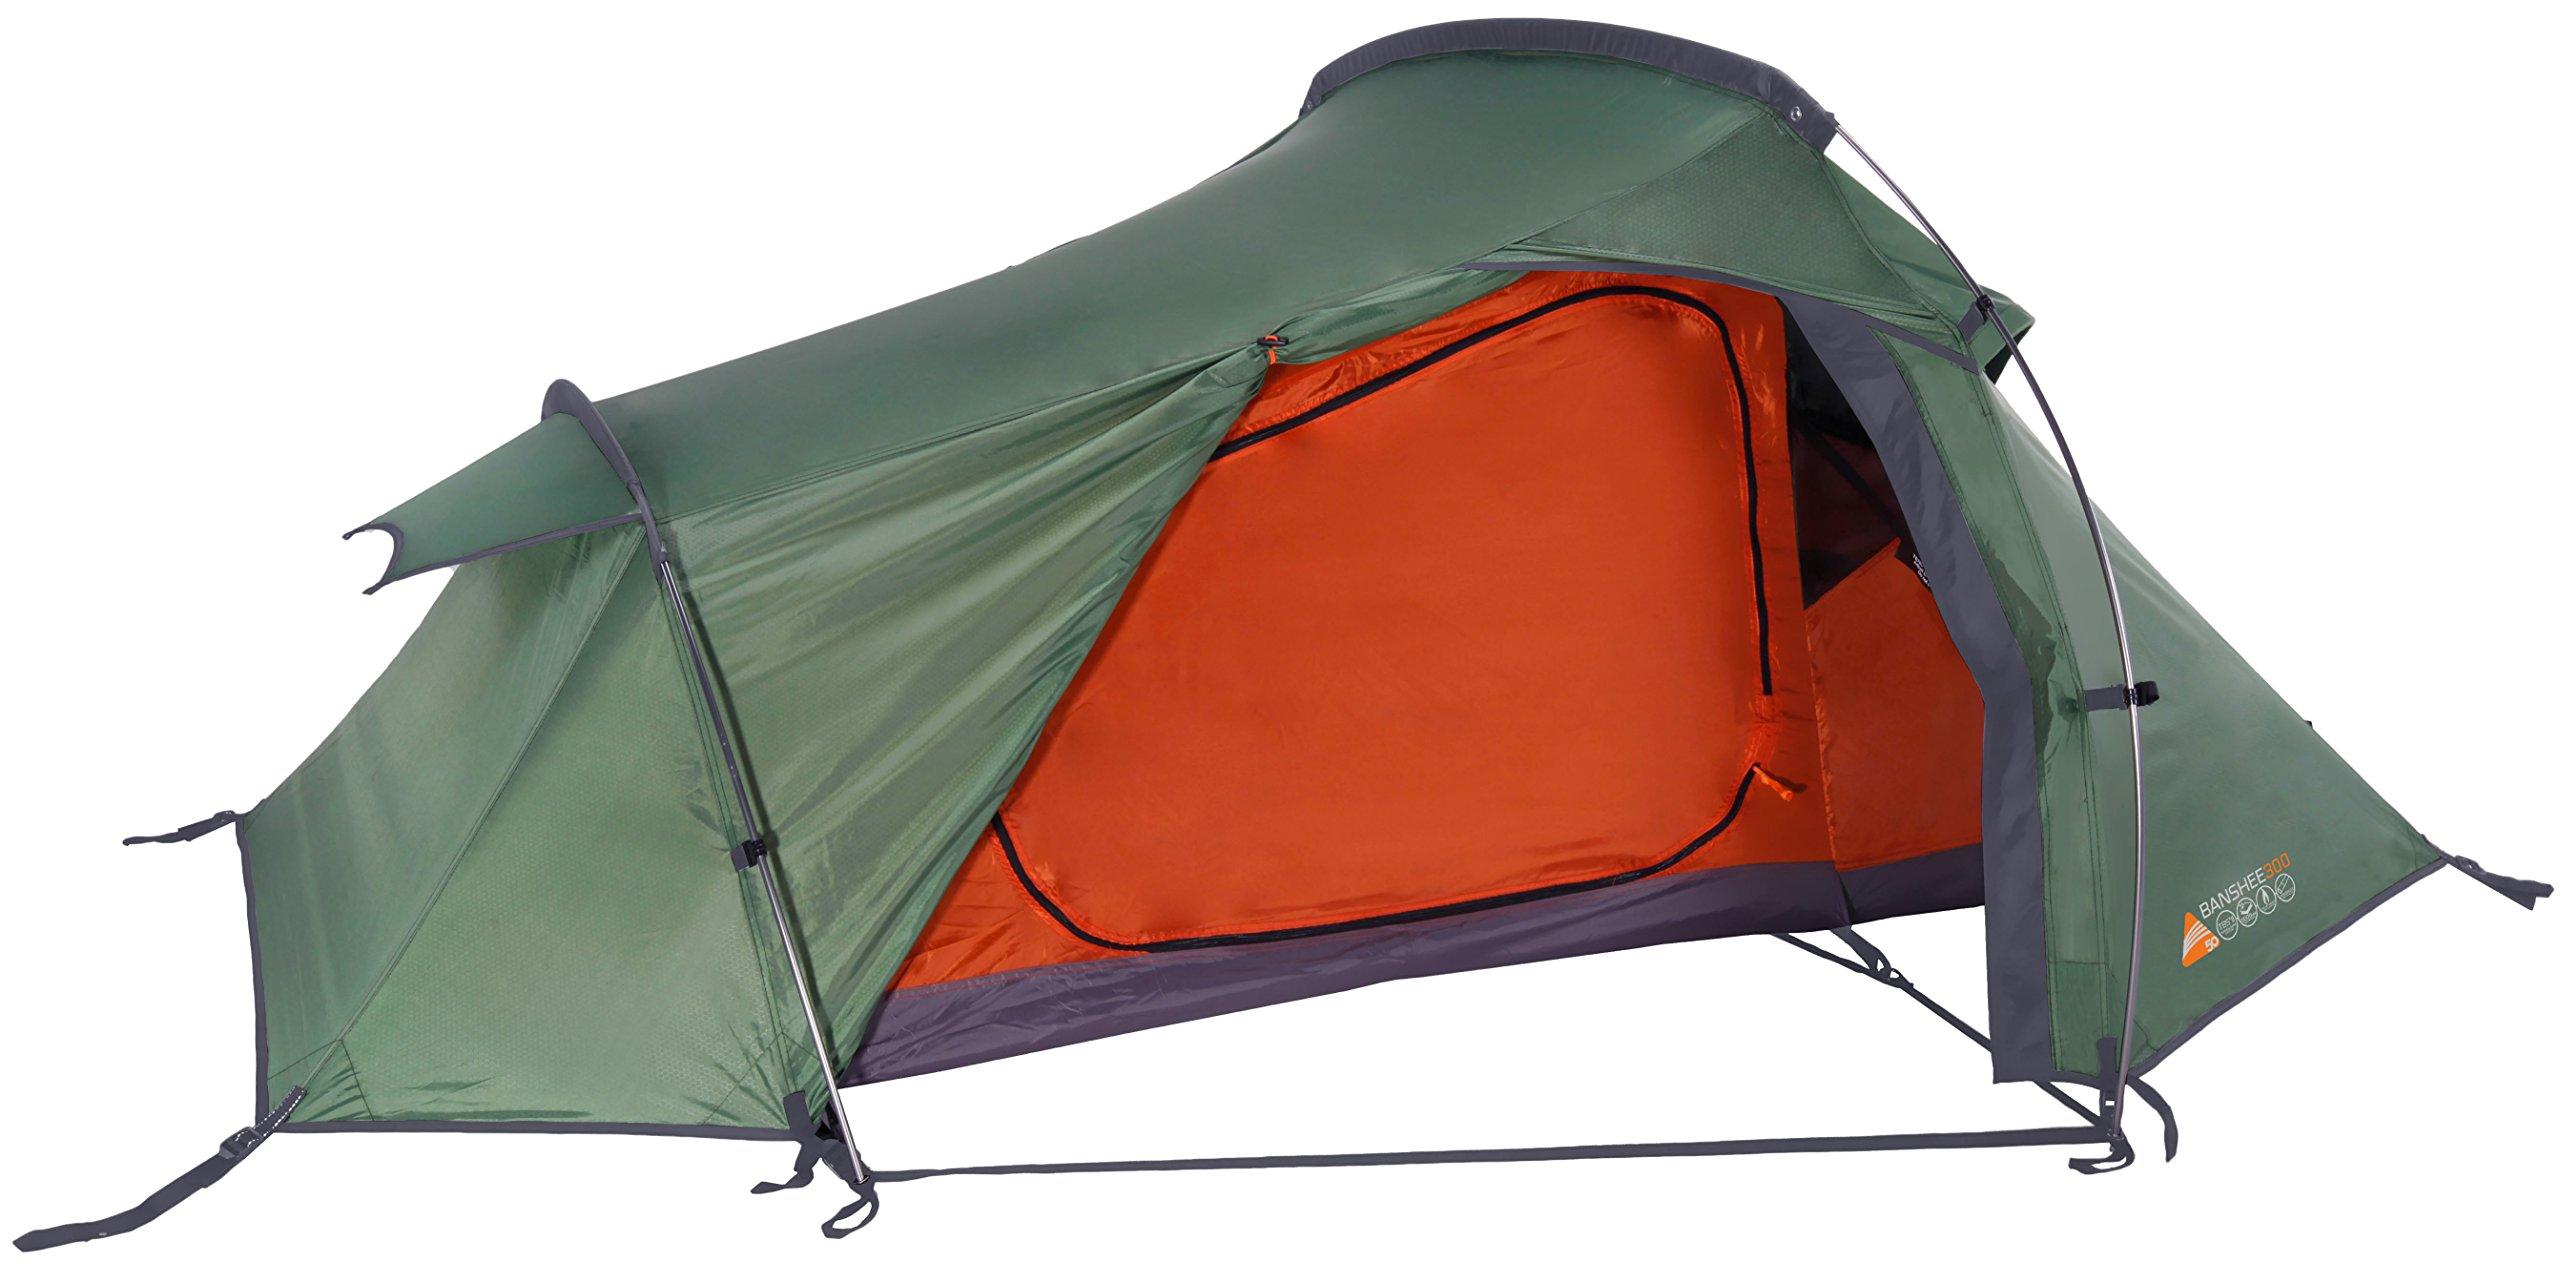 BANSHEE 300 - 3 Person Tunnel Tent - 3 season TREKKING TENT - LIGHTWEIGHT TENT F  sc 1 st  eBay & BANSHEE 300 - 3 Person Tunnel Tent - 3 season TREKKING TENT ...